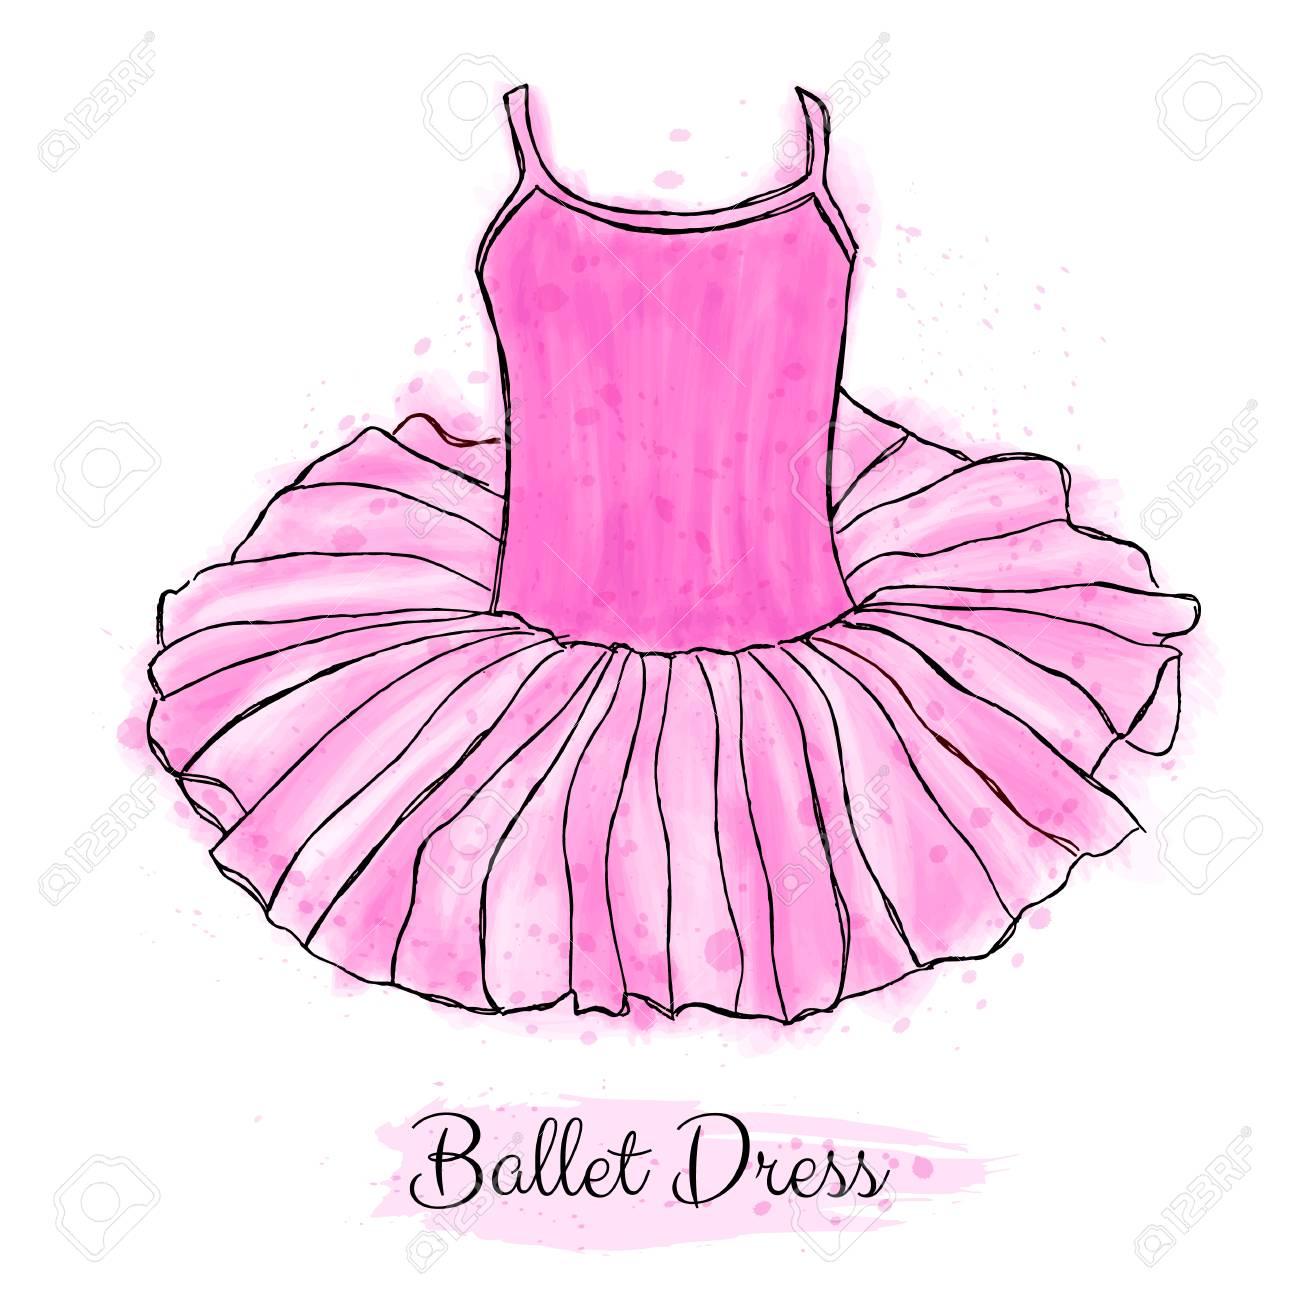 Vestido Rosa Tutú Bailarina. Vestido De Baile De Ballet Clásico ...